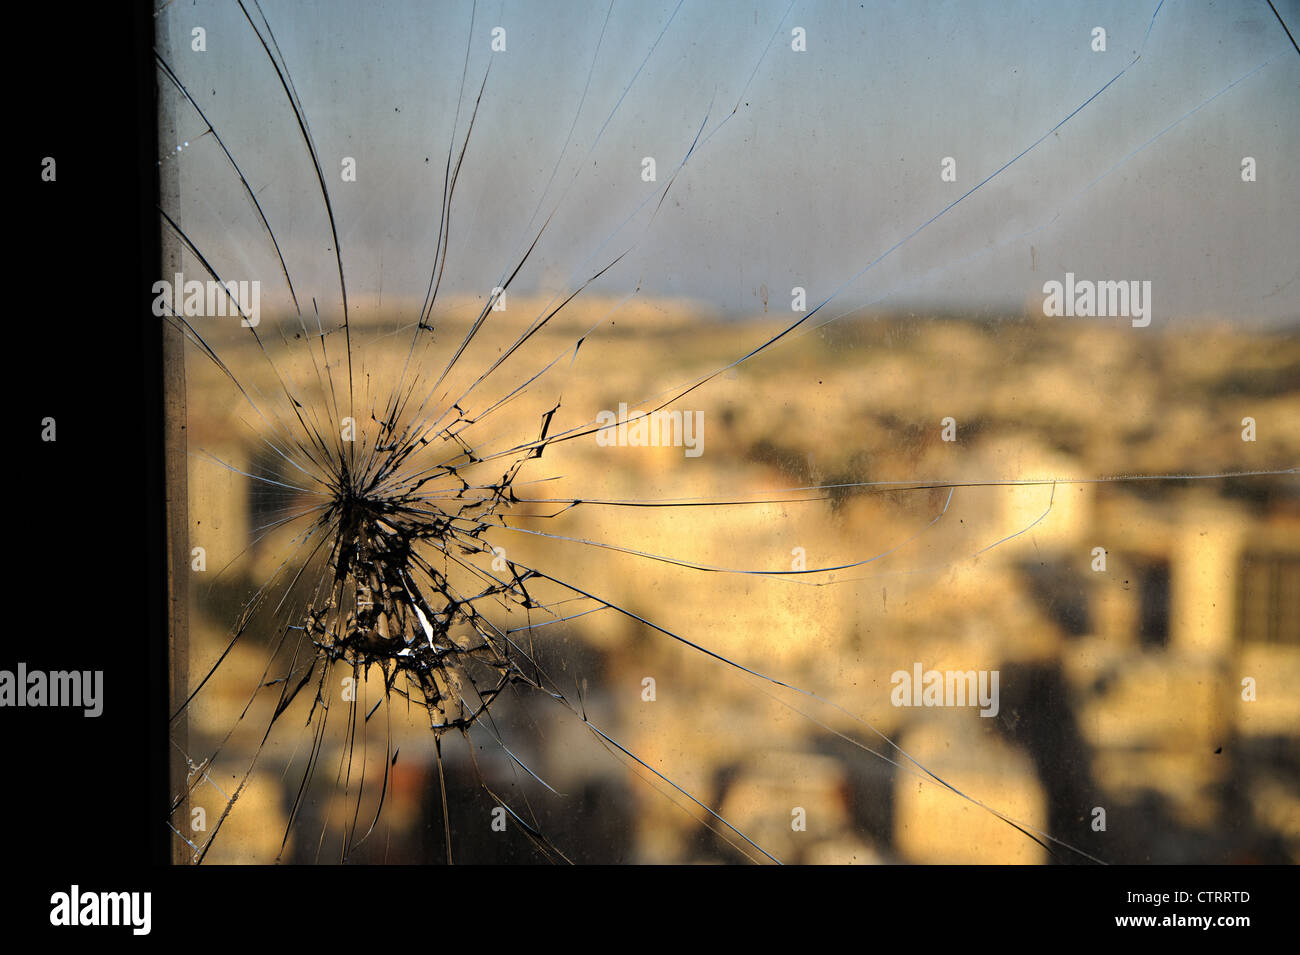 Broken window, cracked glass on urbanic background - Stock Image